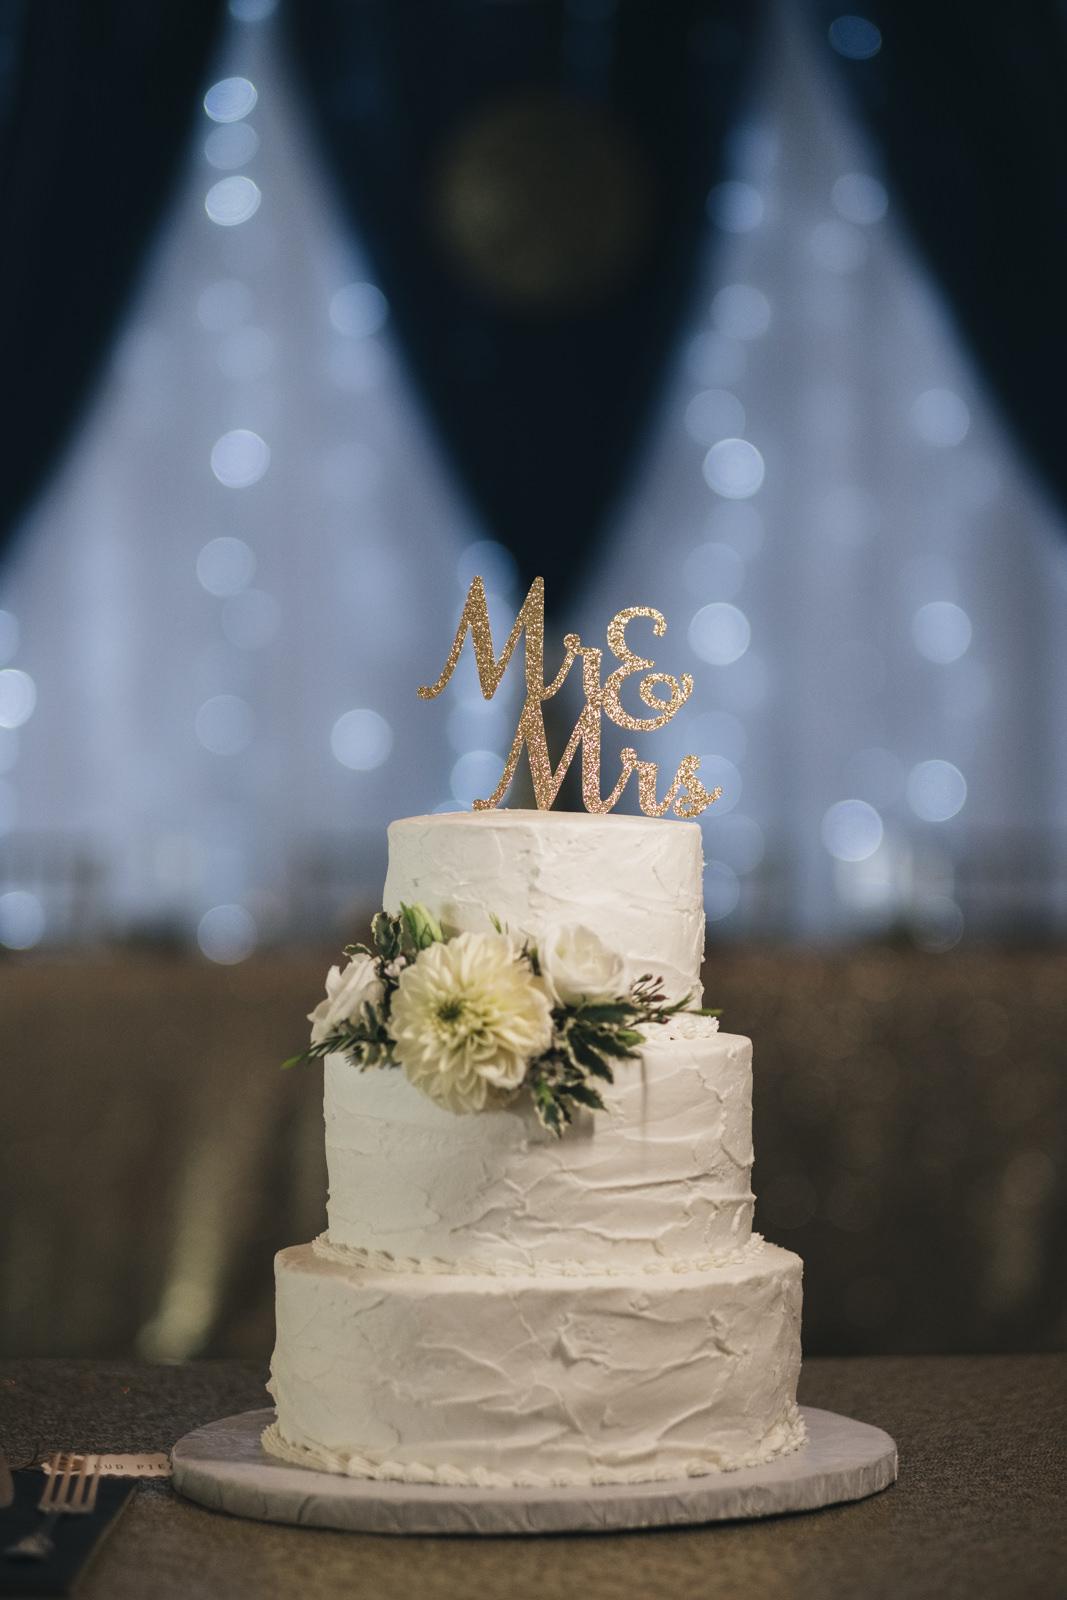 The bride and groom's wedding cake is from Cigi Cakes custom design in Marblehead Ohio